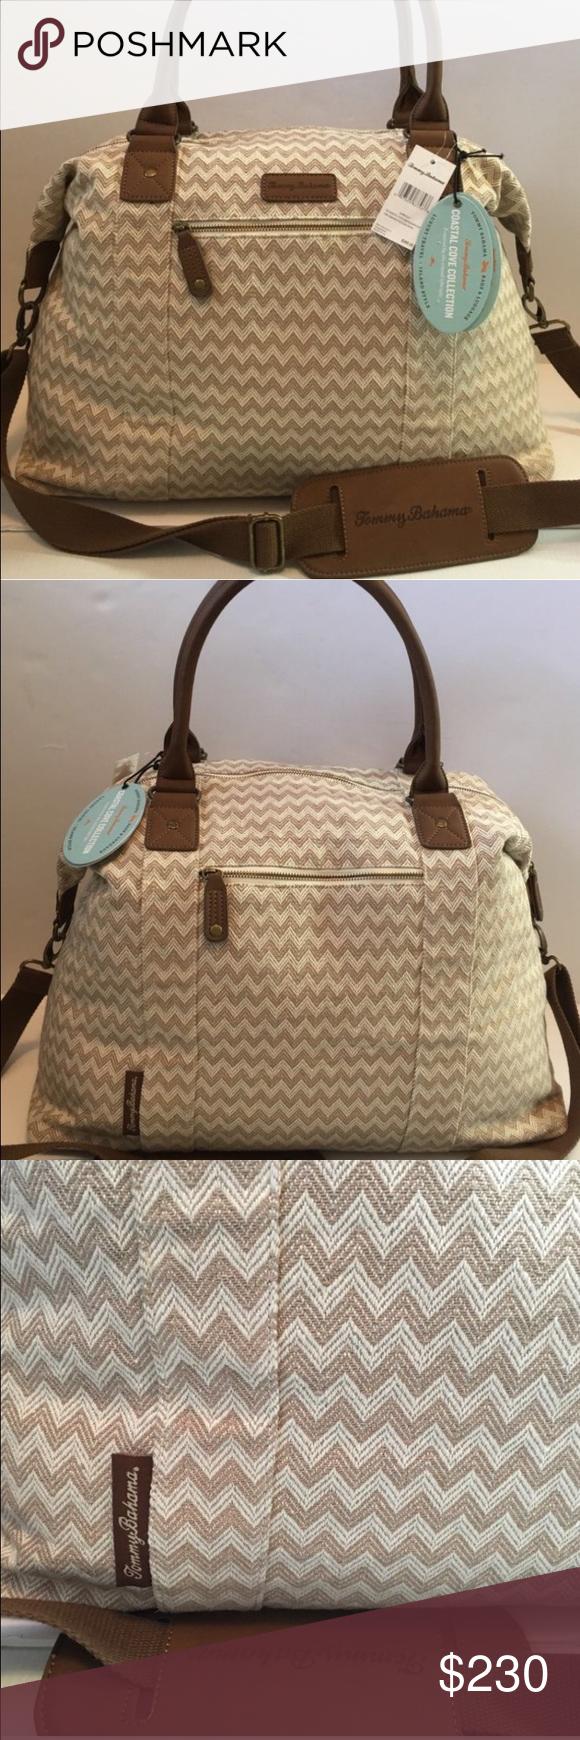 Tommy Bahama Leather Travel Bag  eae9eec303ec6